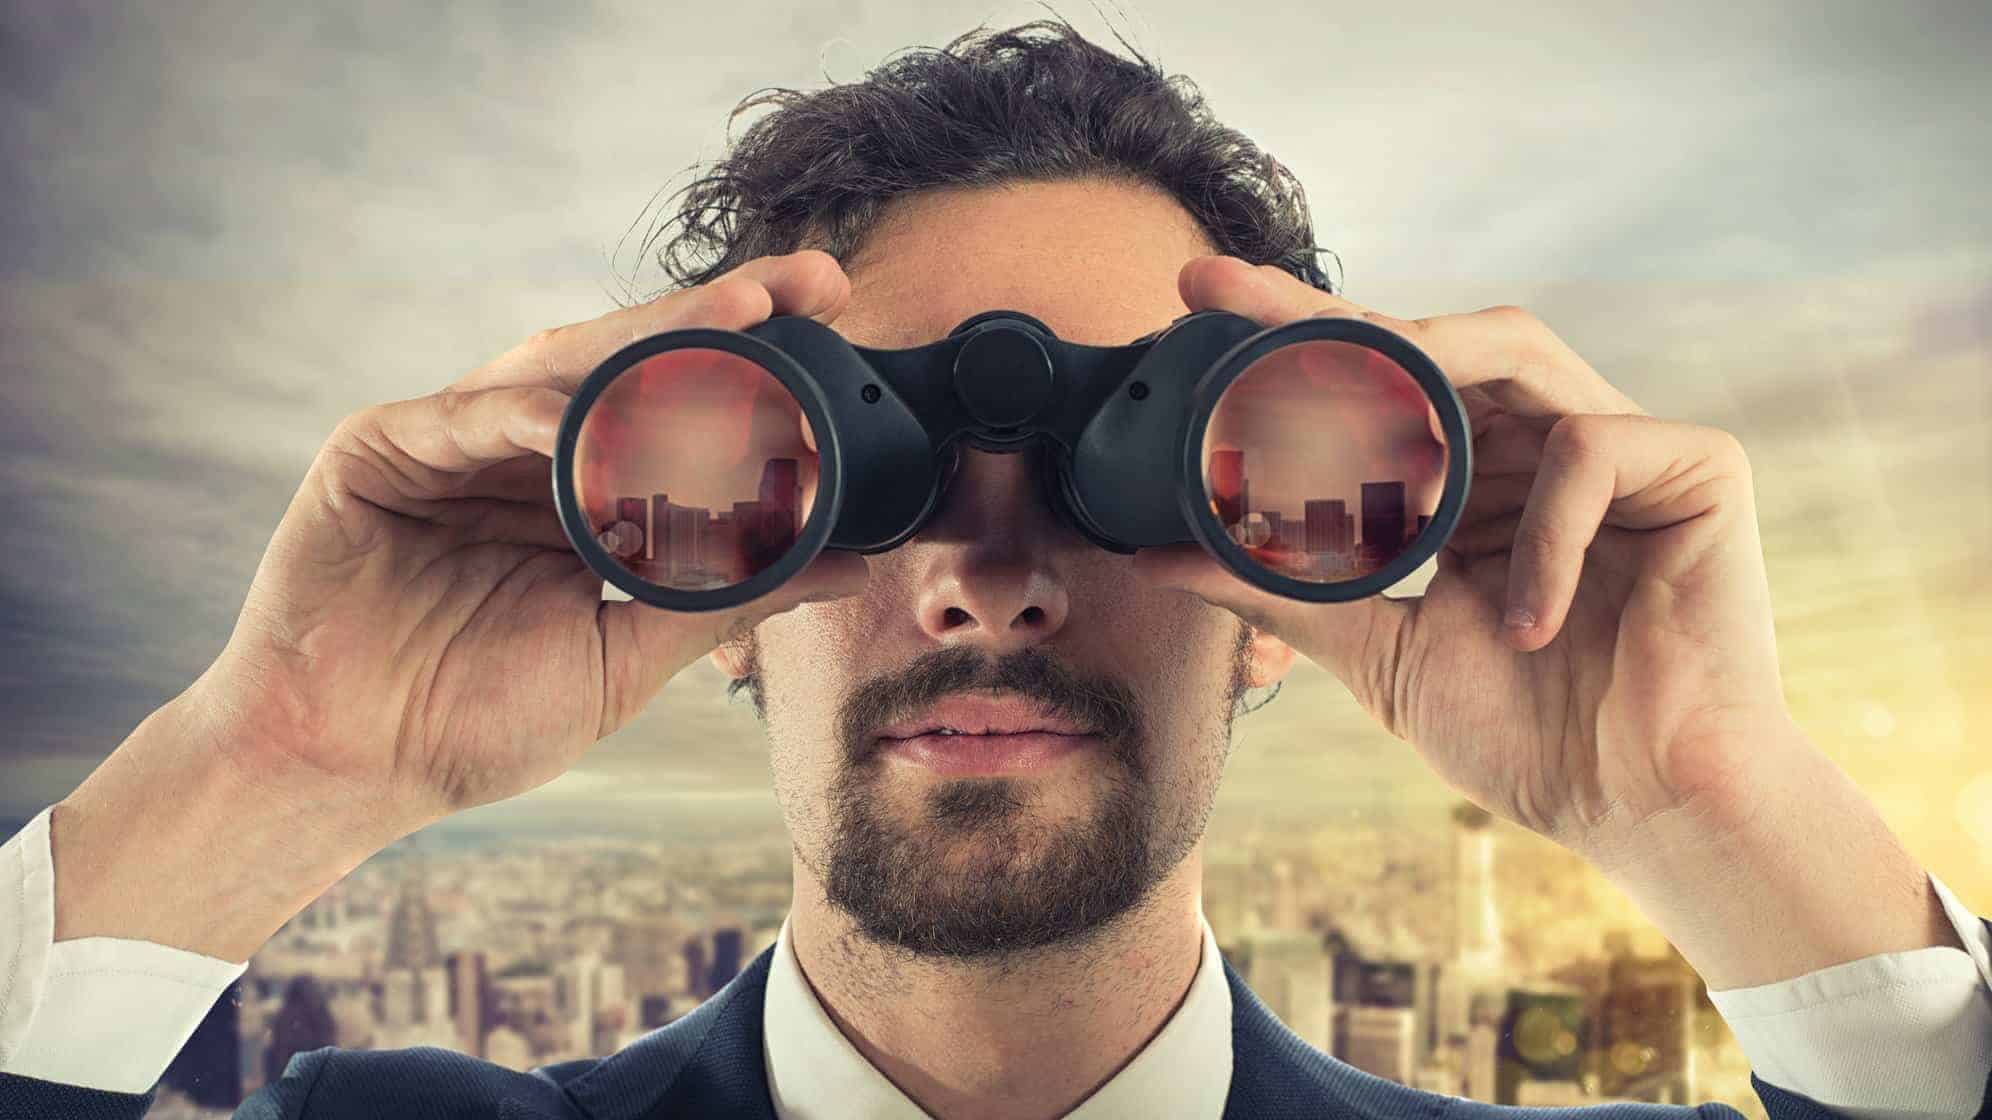 watch, watch list, observe, keep an eye on